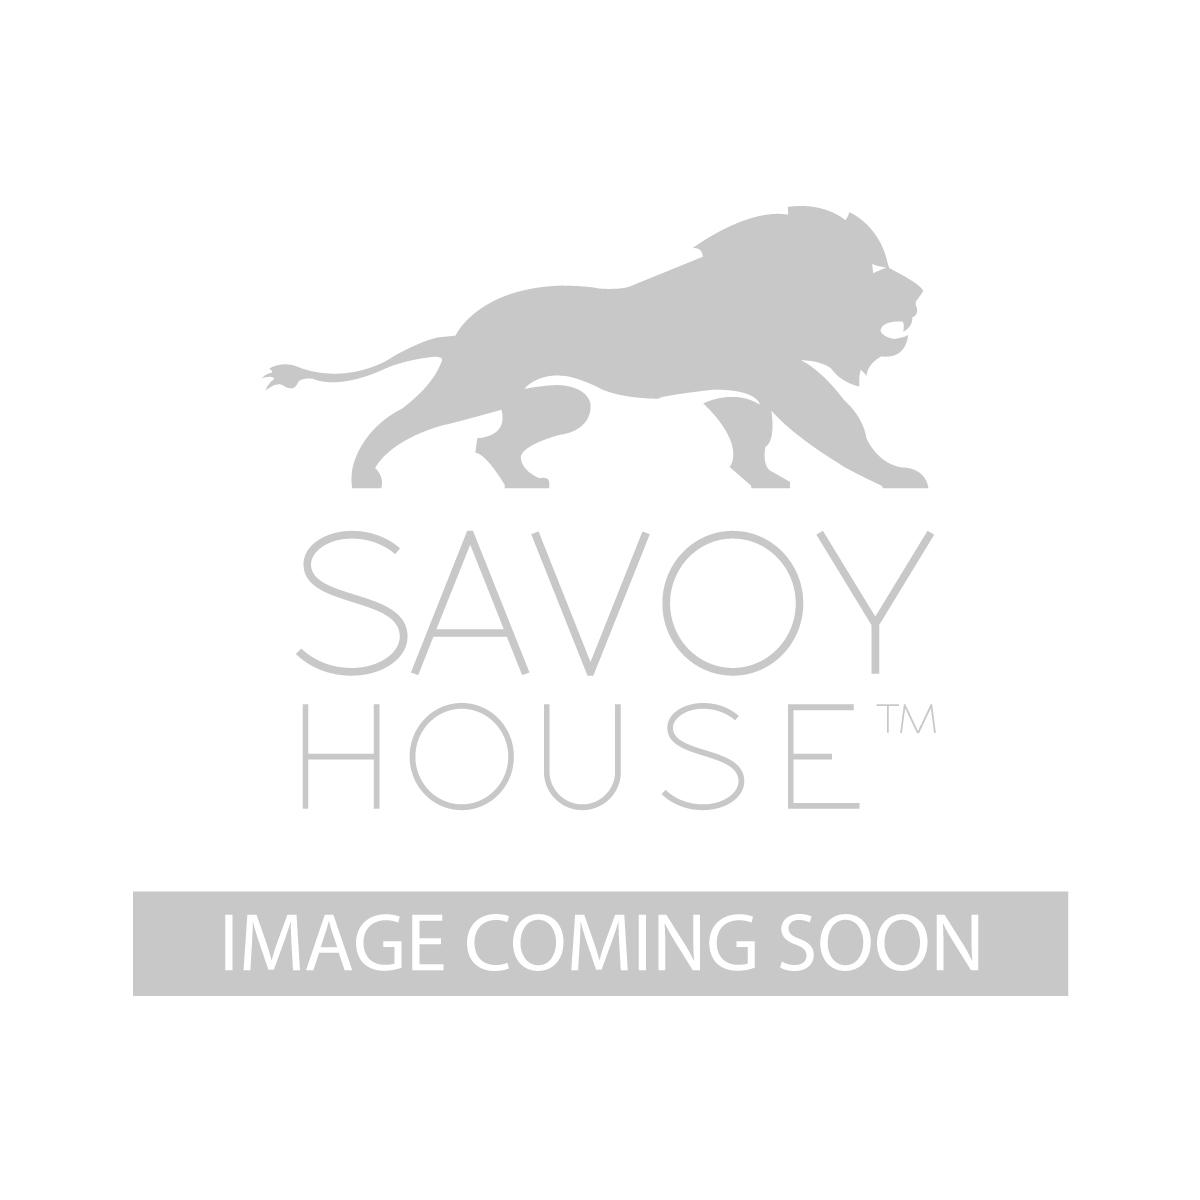 8 232 4 109 downing 4 light bath bar by savoy house downing 4 light bath bar aloadofball Images